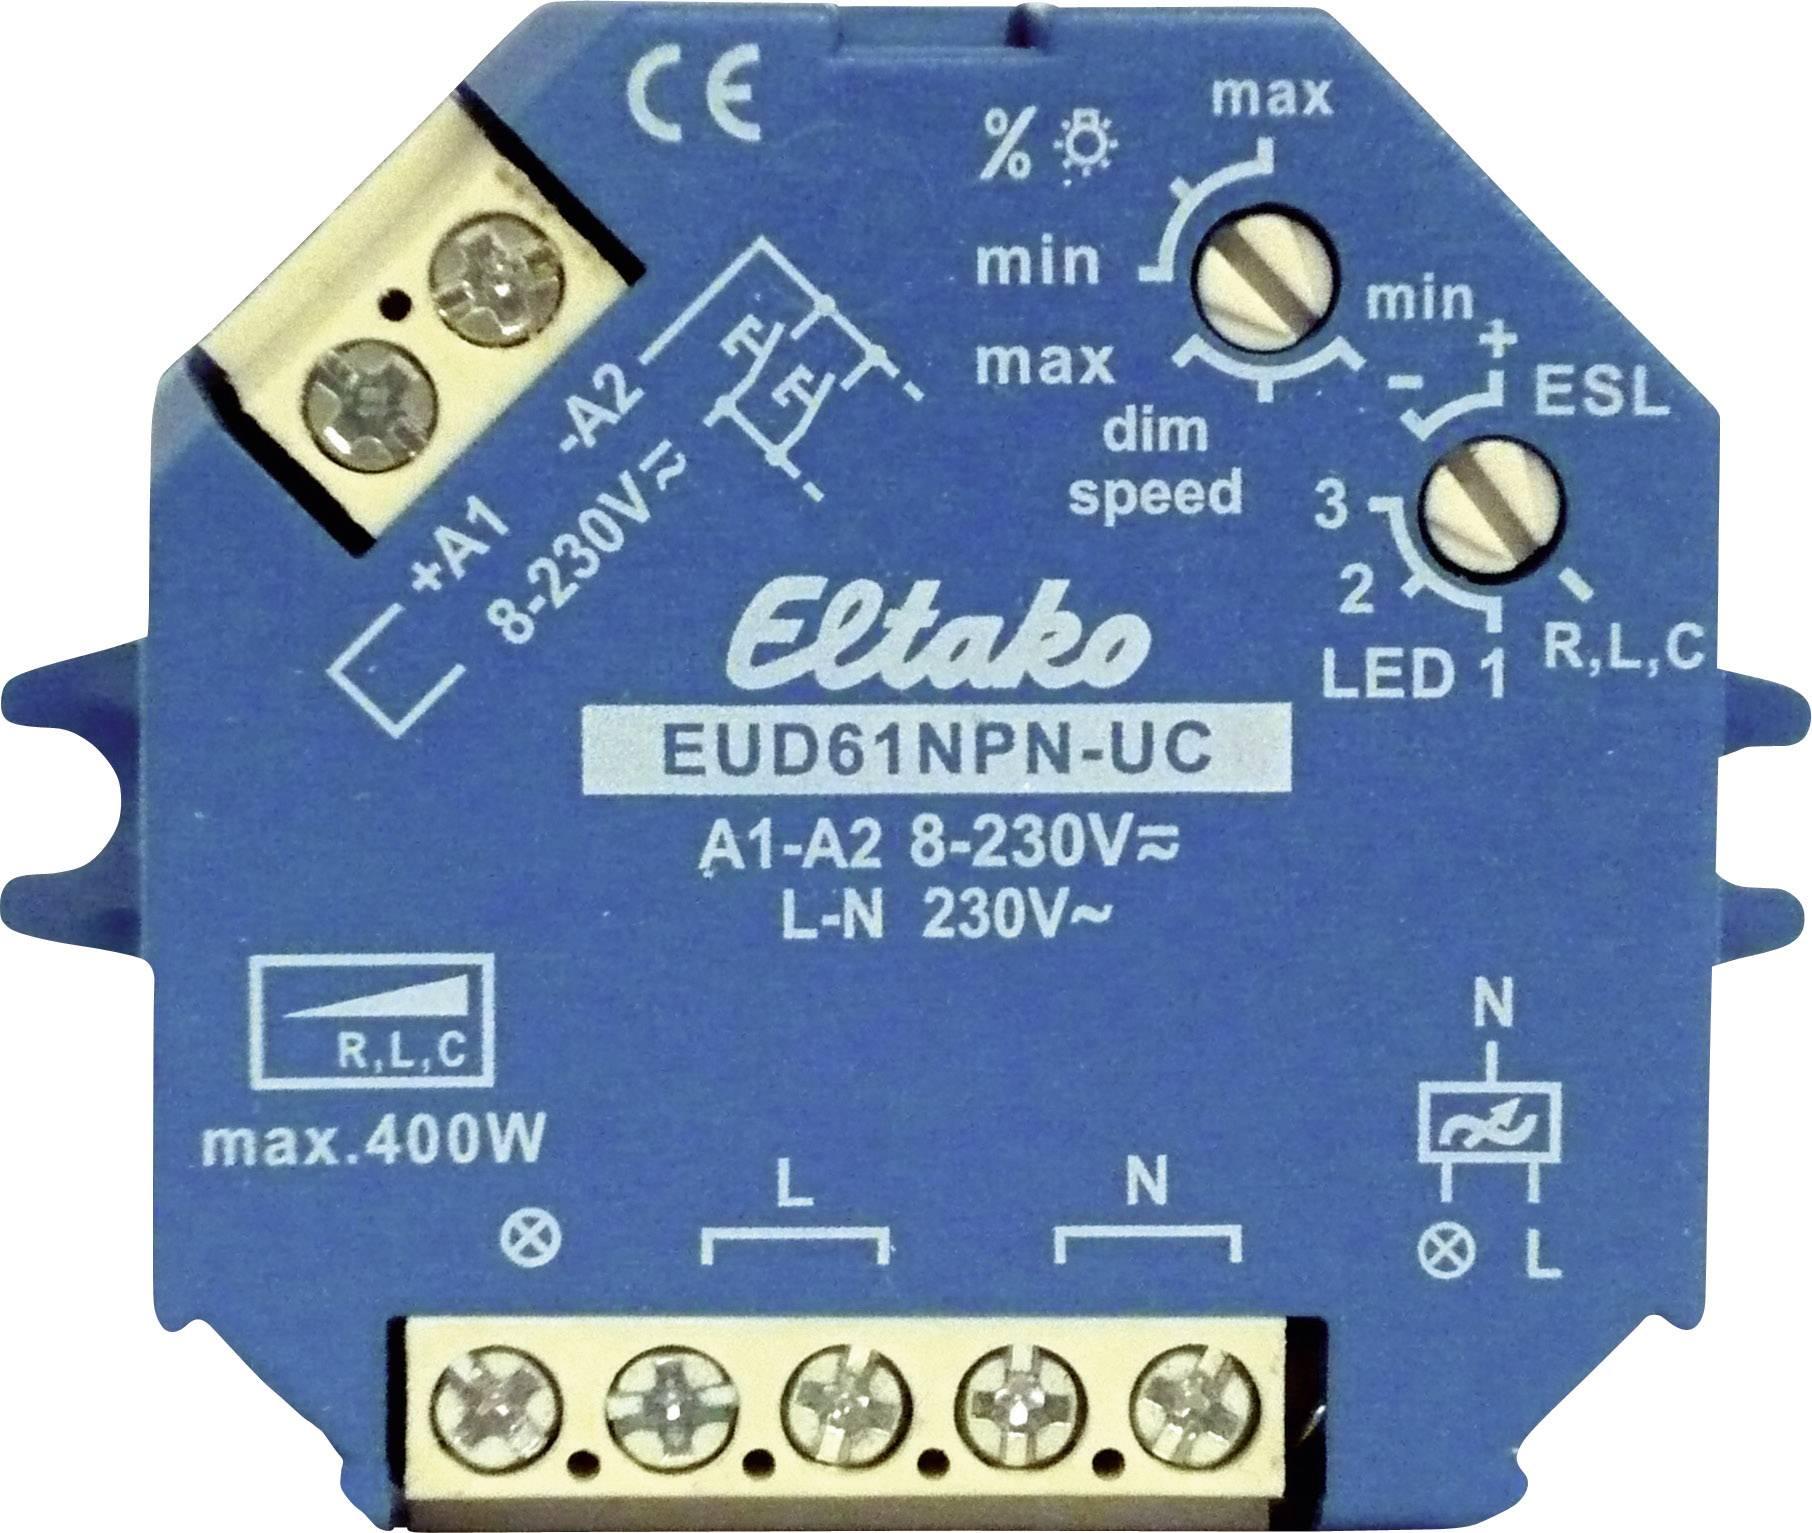 Univerzálny stmievač Eltako EUD61NPN-UC